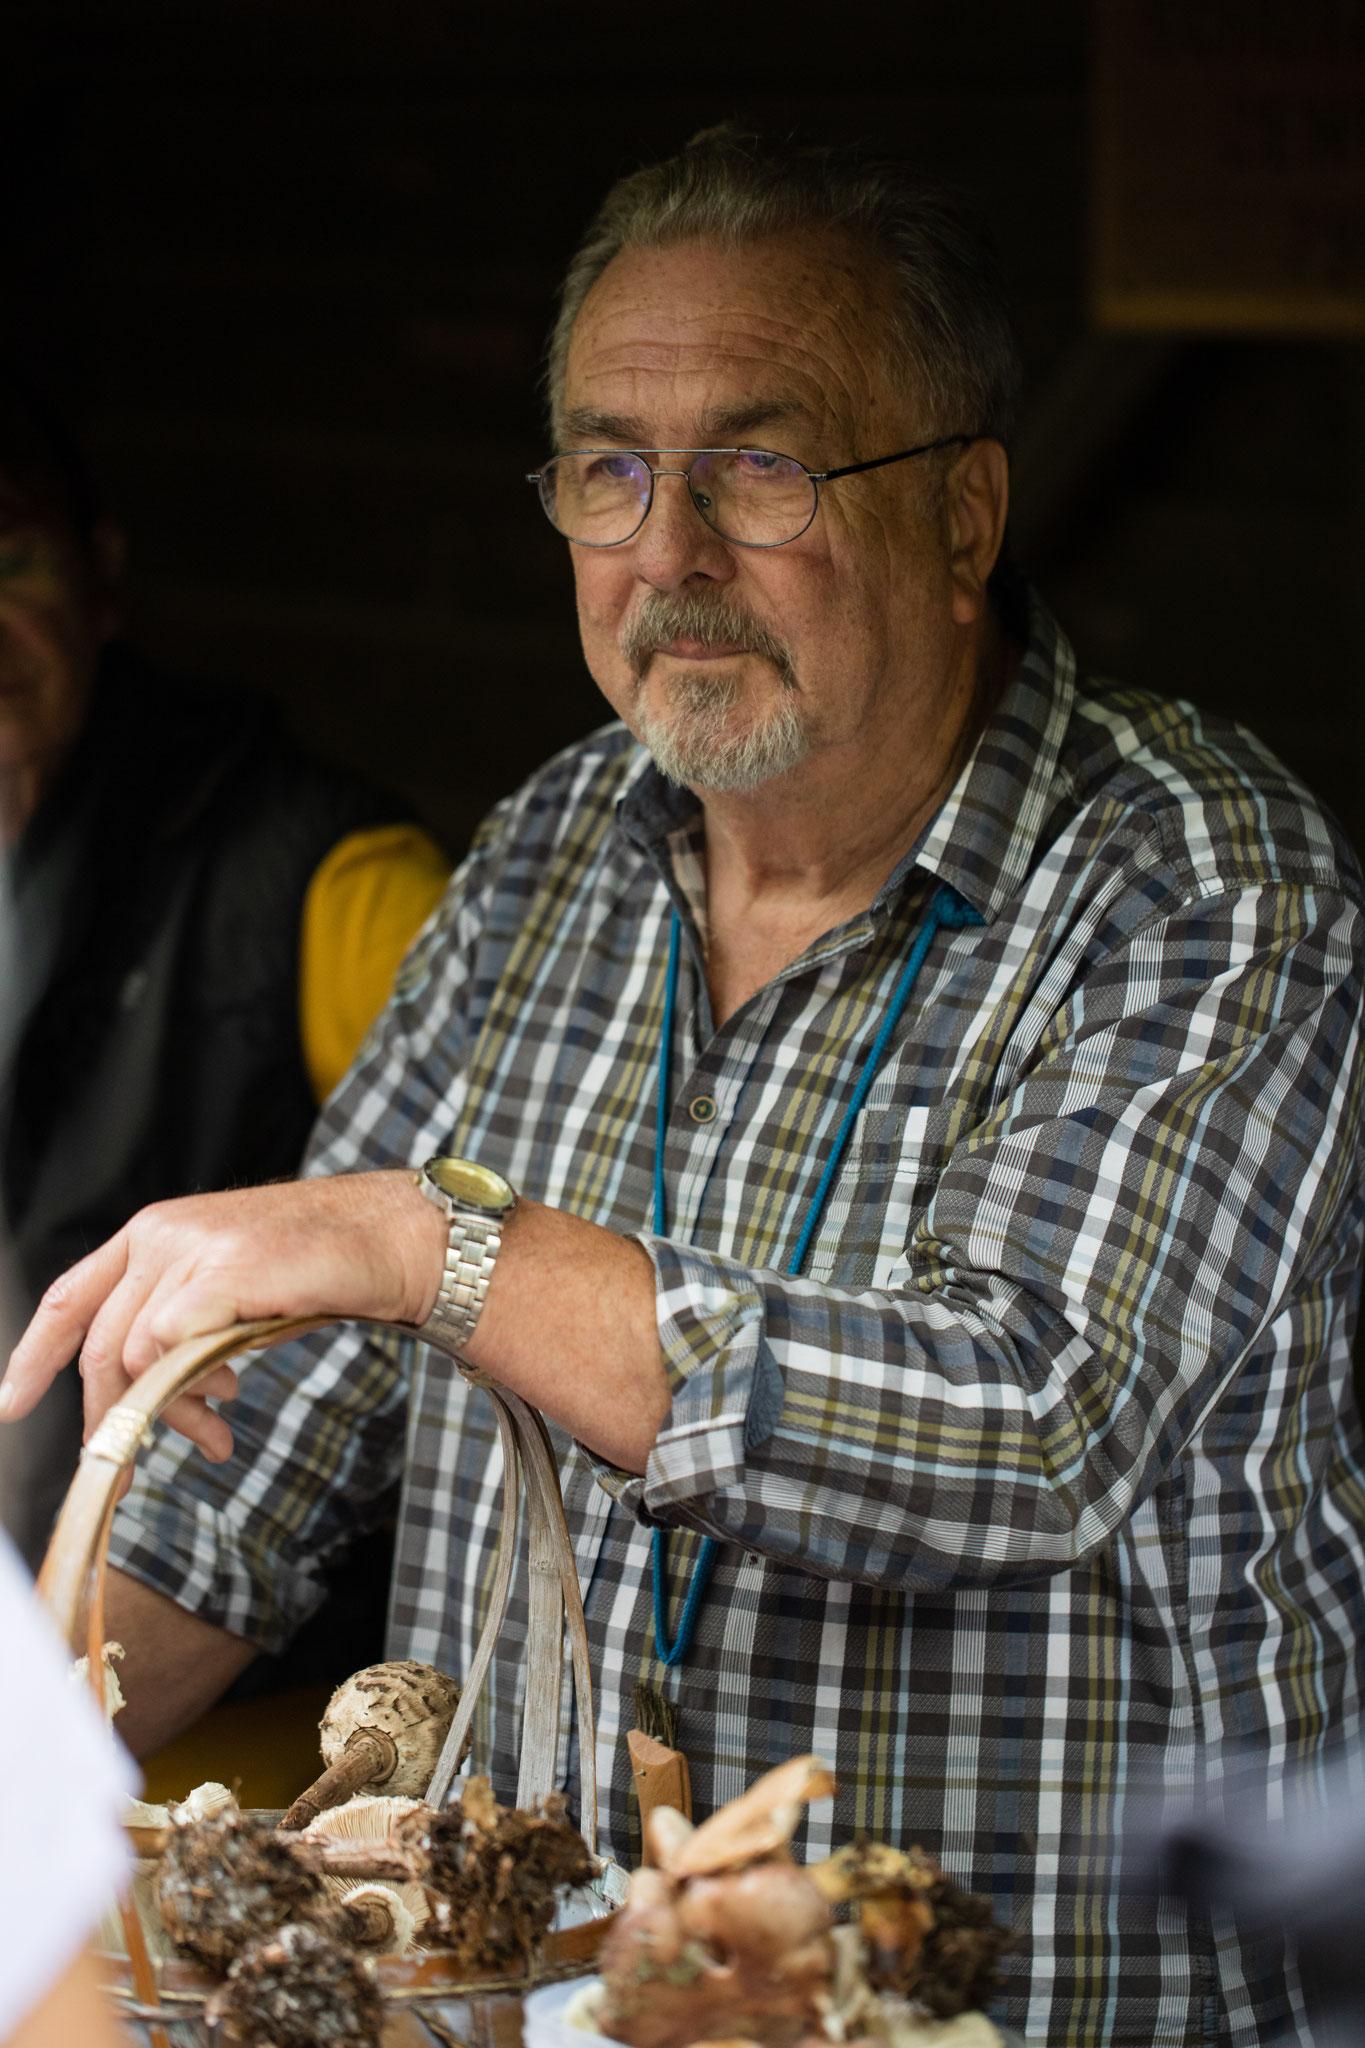 Frank Krajewski bei der Pilzbesprechung (Foto: Andreas Sebald)